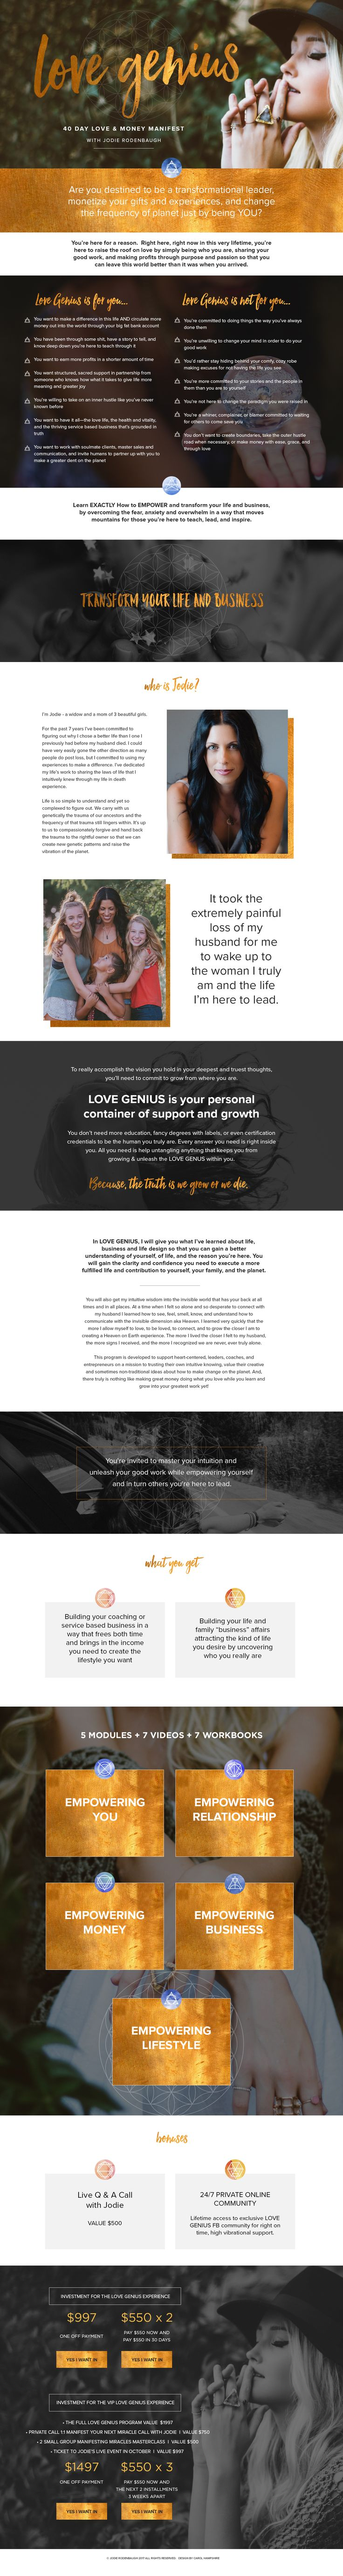 One of my sale page designs for Jodie Sutulovich Rodenbaugh's new online signature program - Love Genius. http://jodierodenbaugh.com/lovegenius/